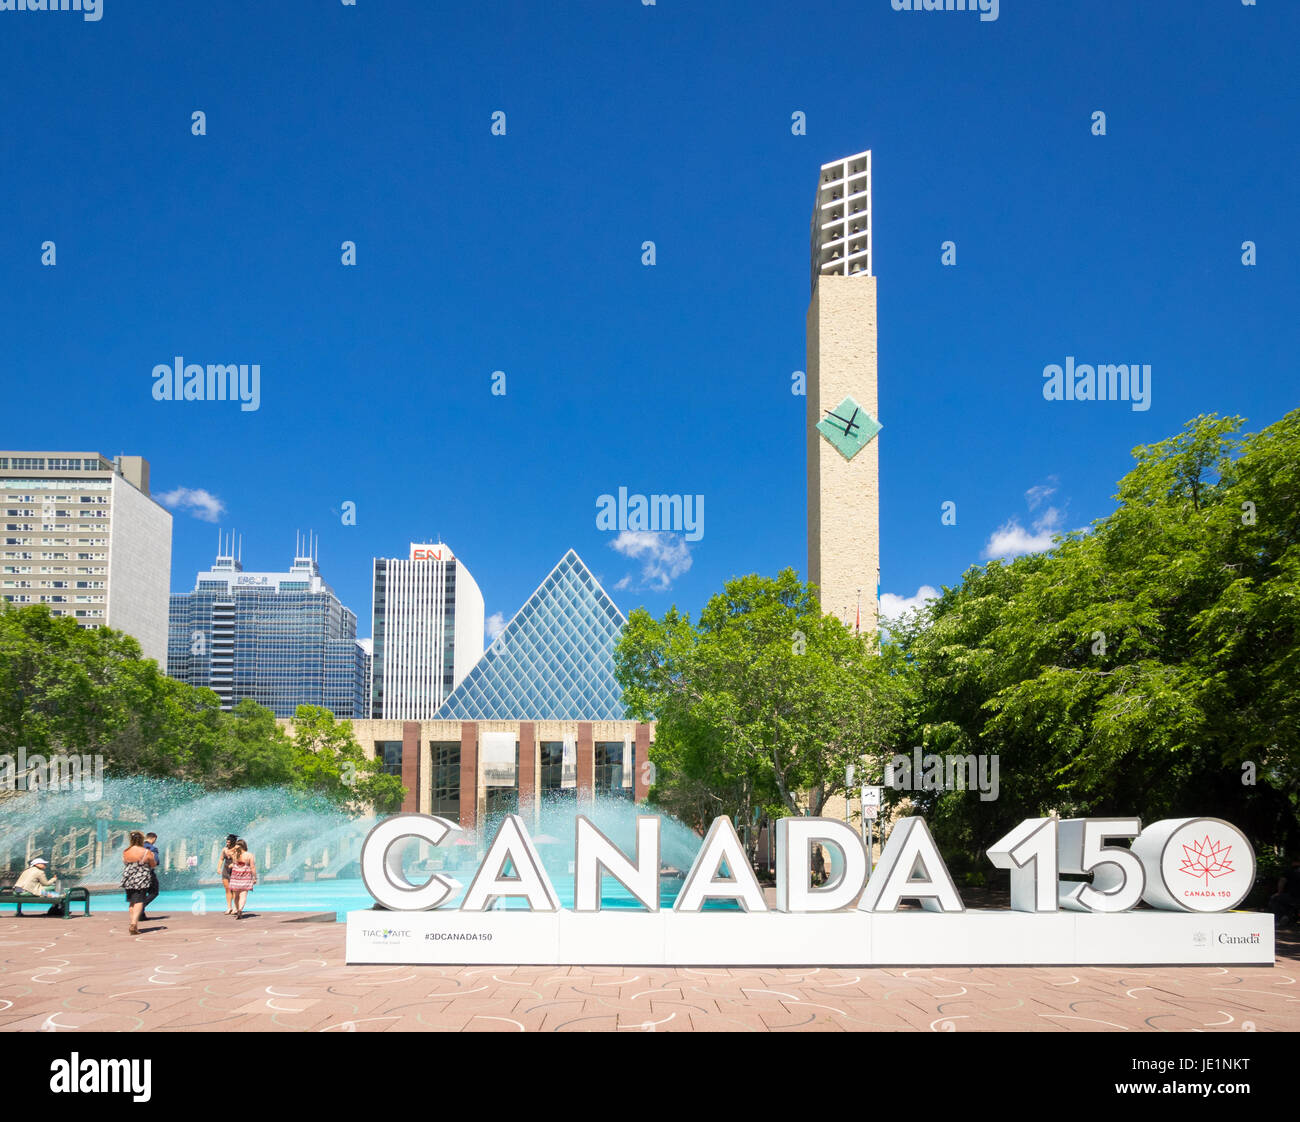 Le Canada 150 3D signe à Sir Winston Churchill Square à Edmonton, Alberta, Canada. L'enseigne célèbre Photo Stock